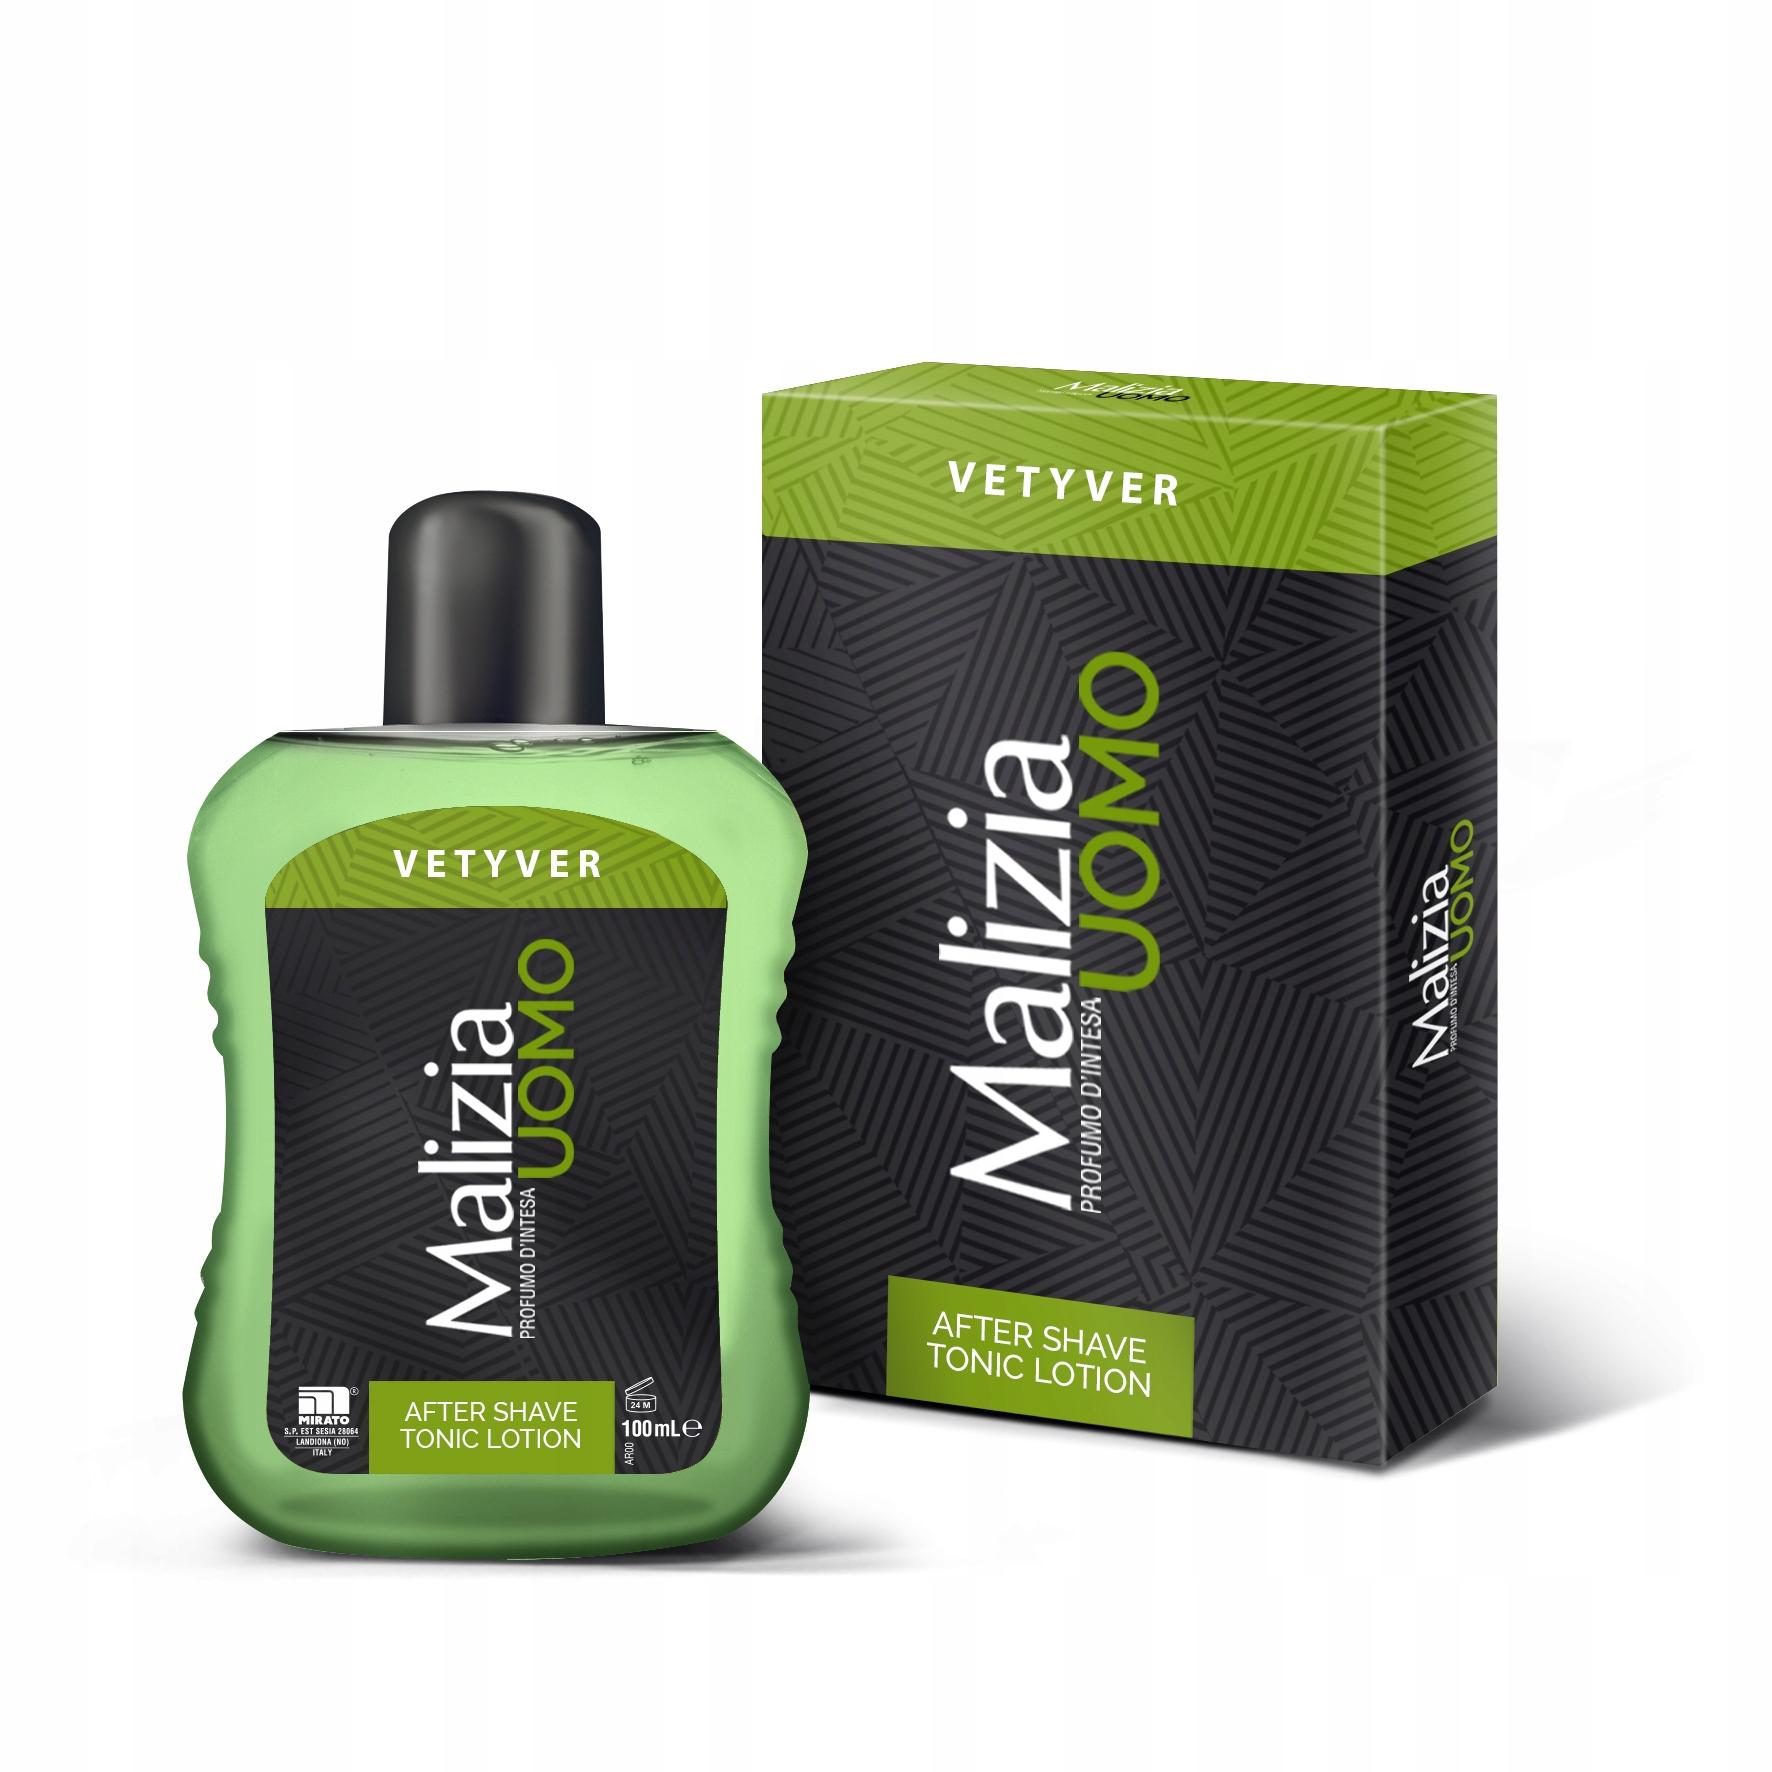 Malizia Uomo Vetyver - вода после бритья (100 мл)